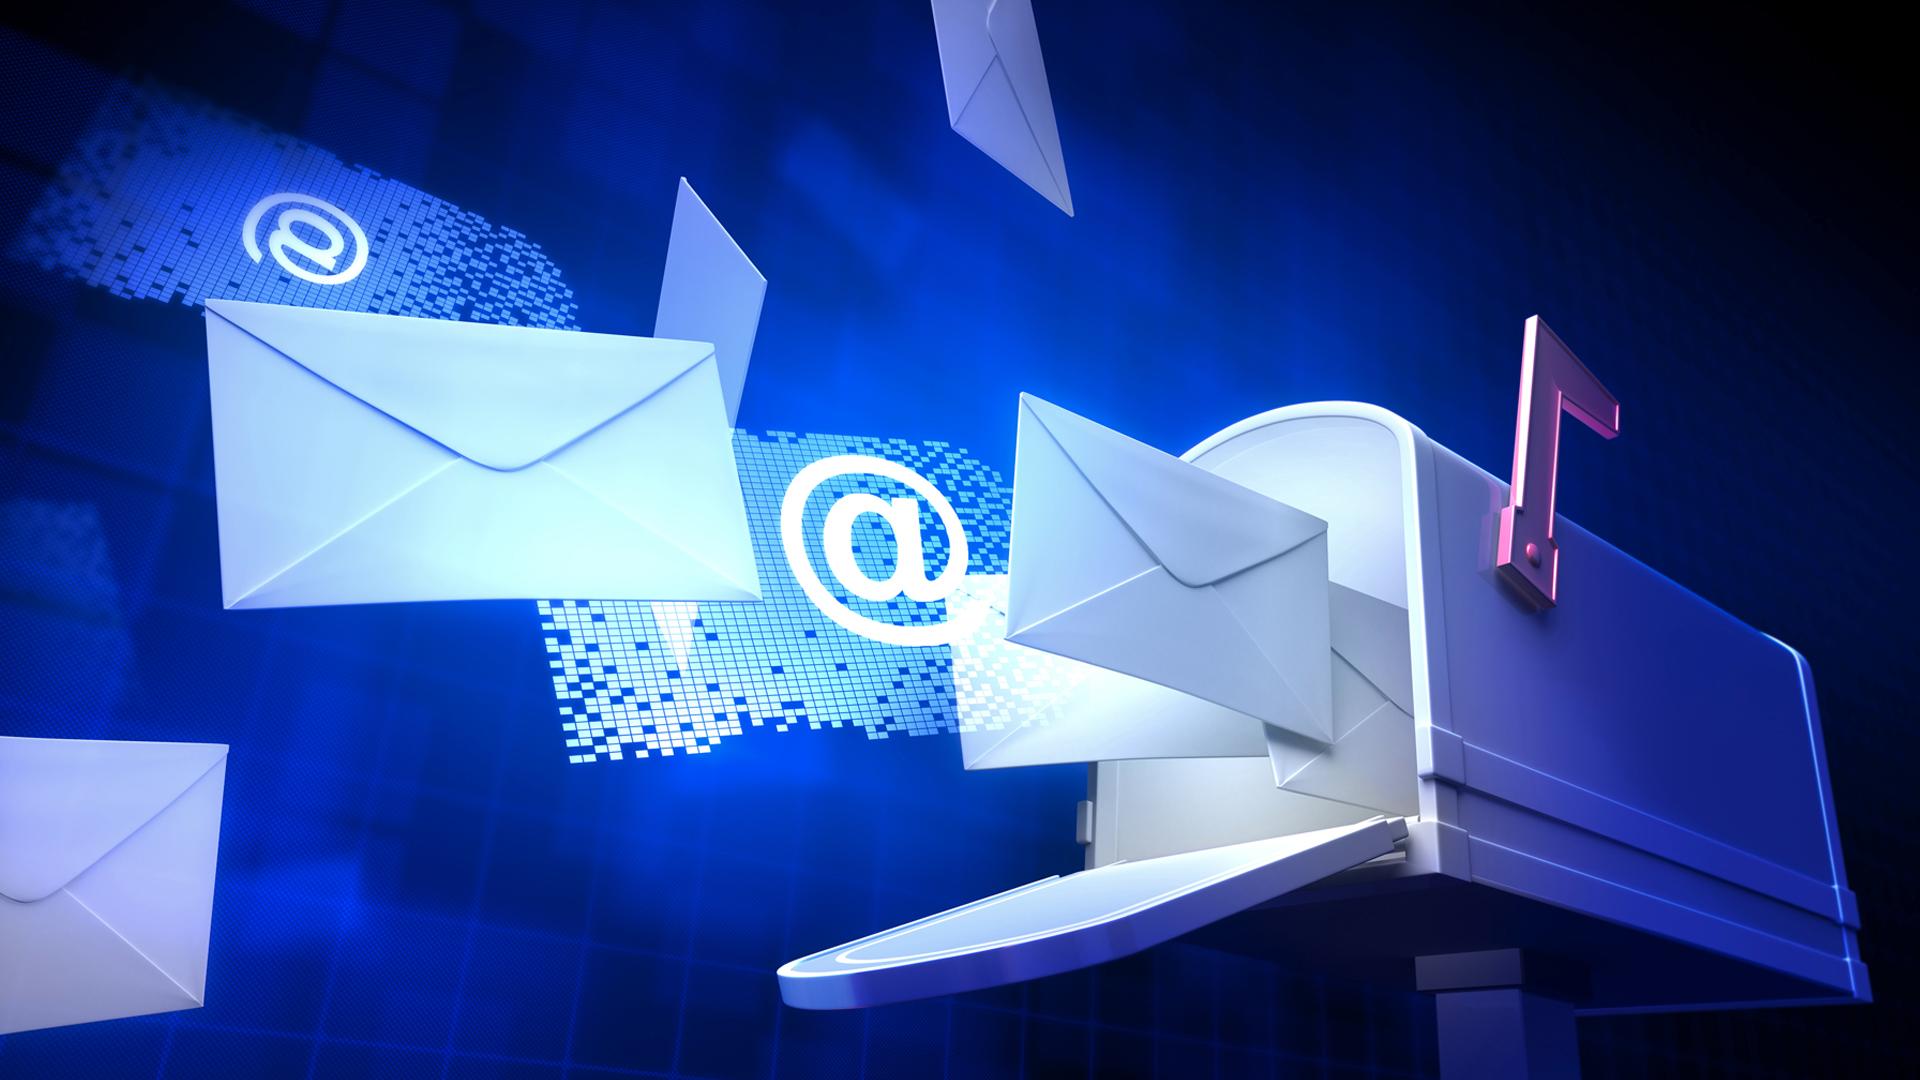 bg-email-marketing1